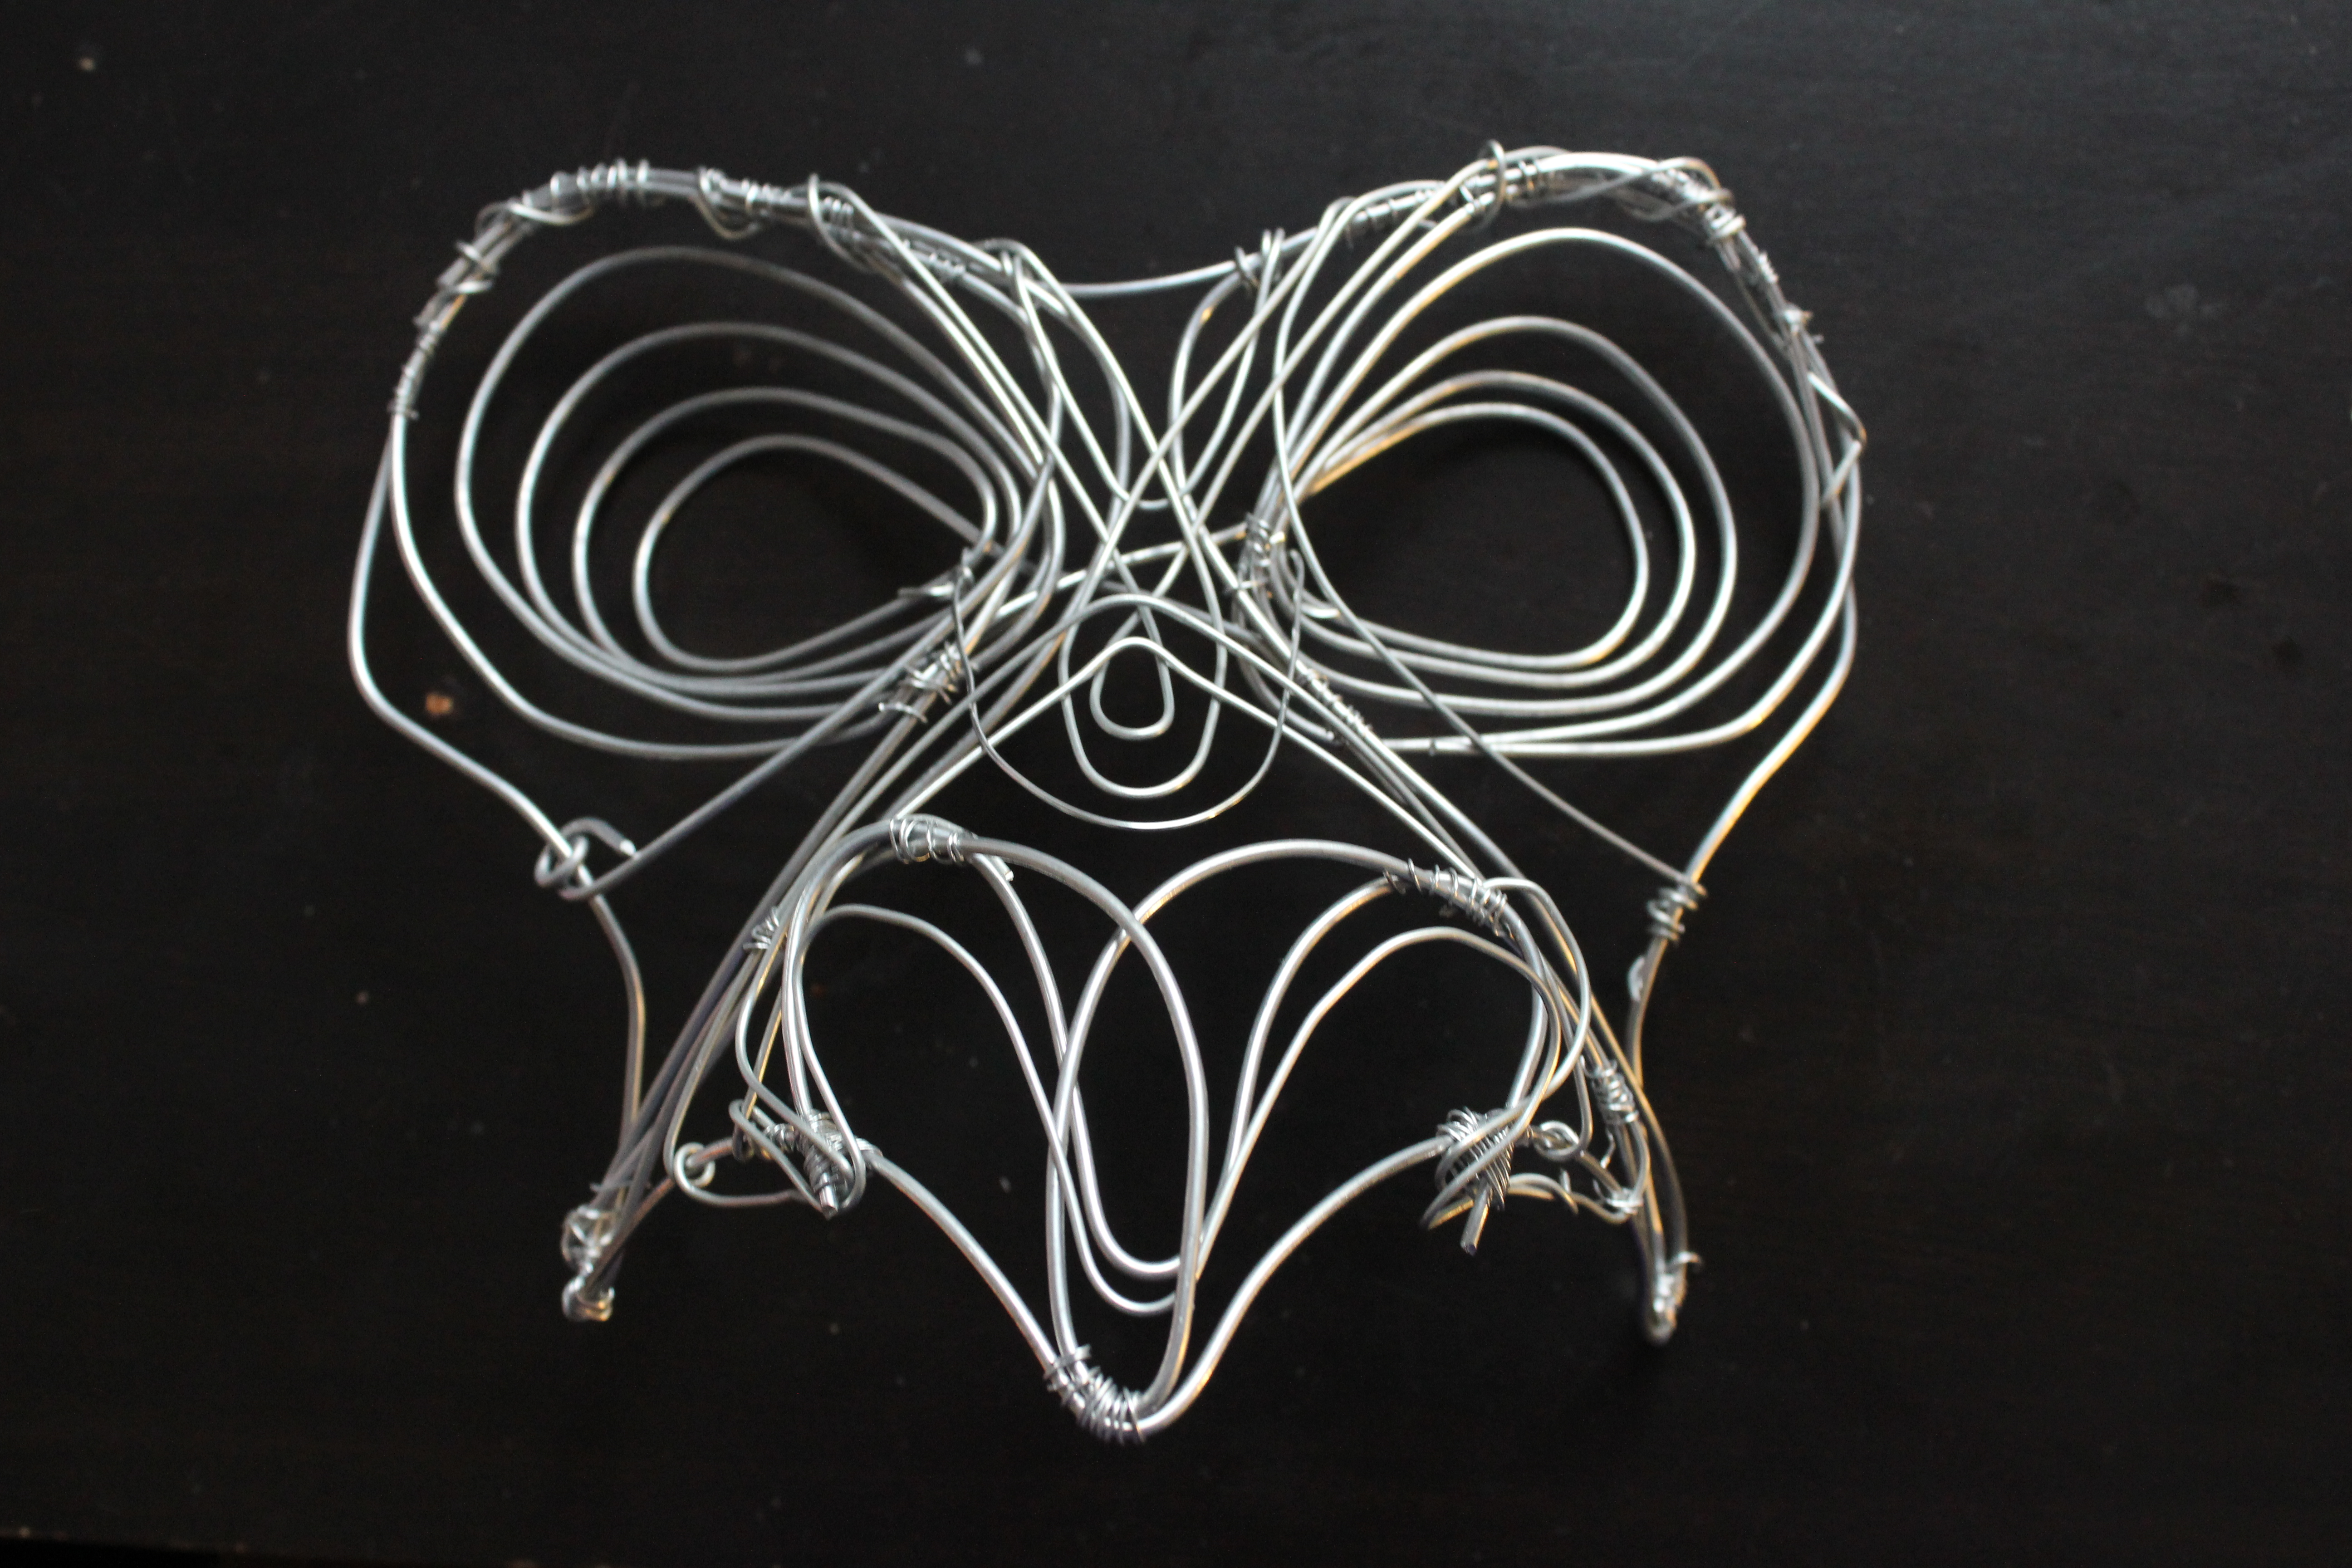 gorilla faceplate - Liz Kosack